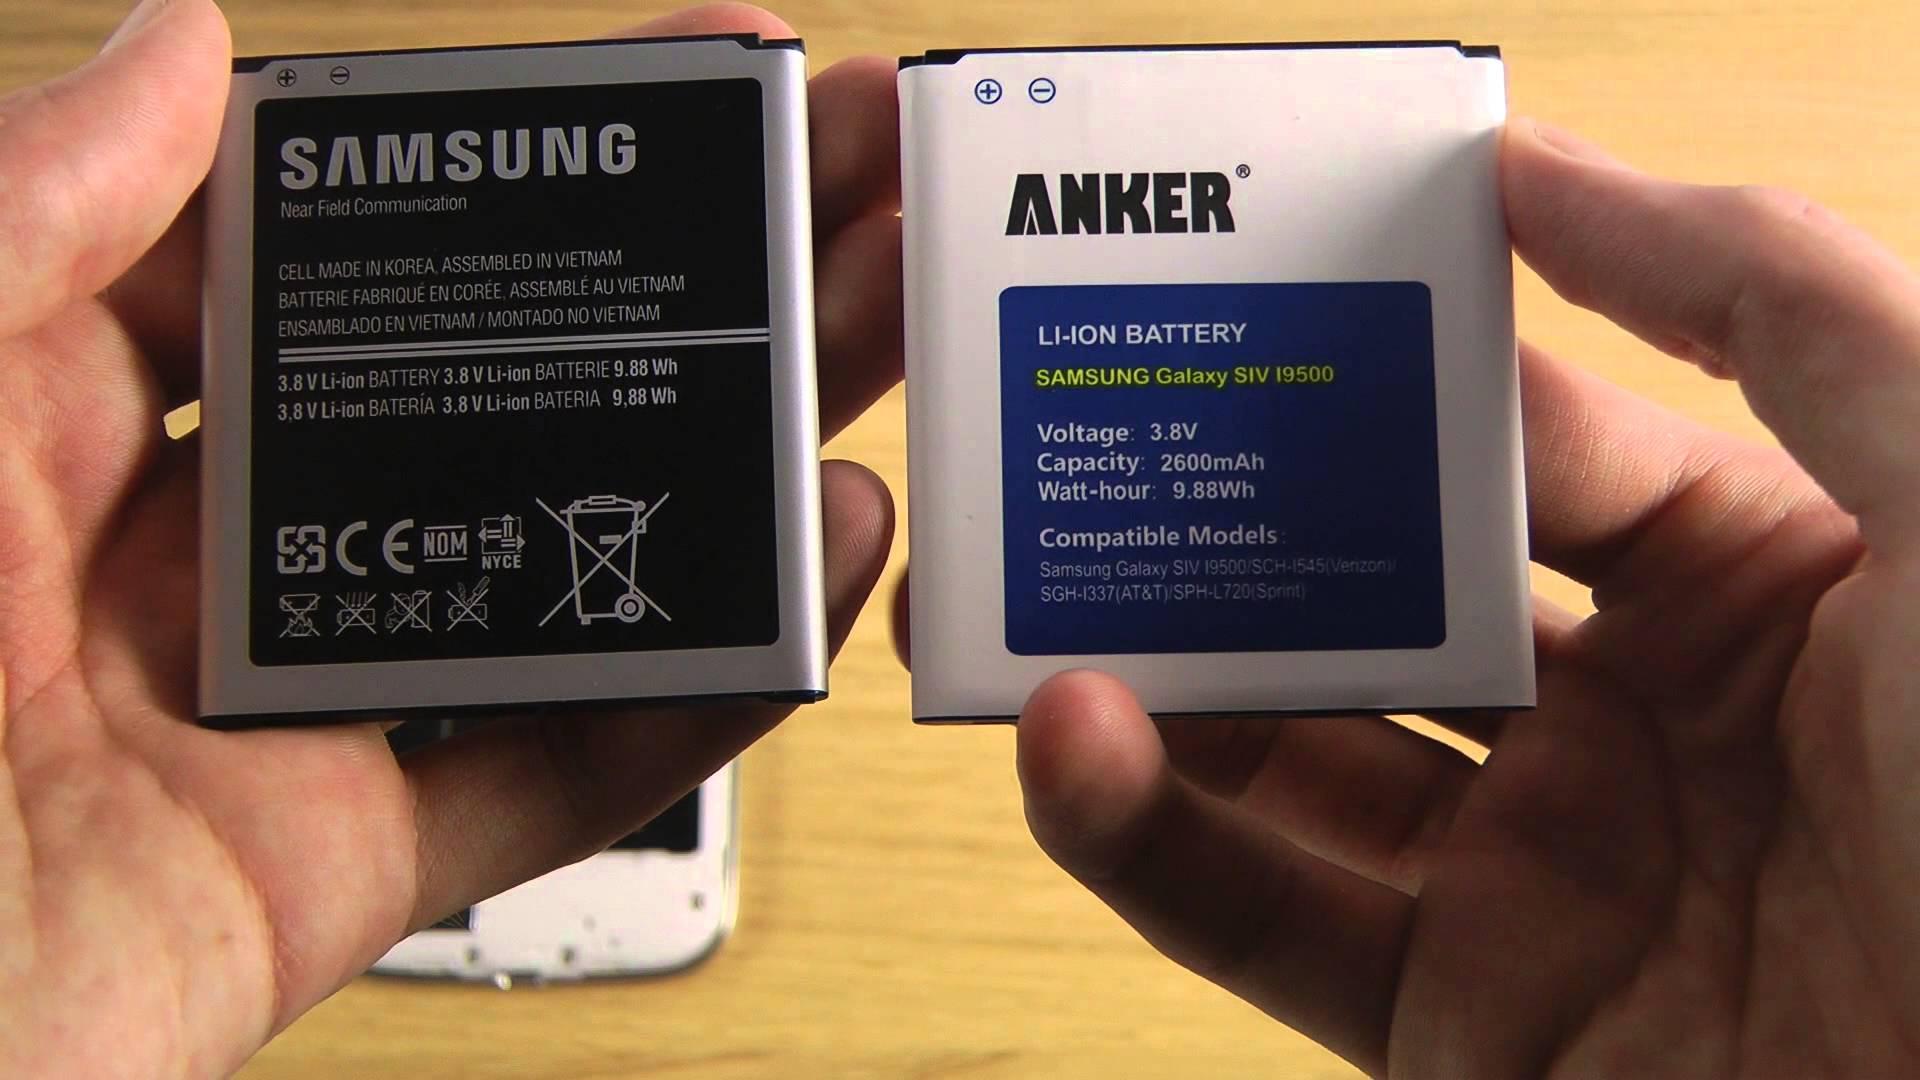 batterie anker galaxy s4